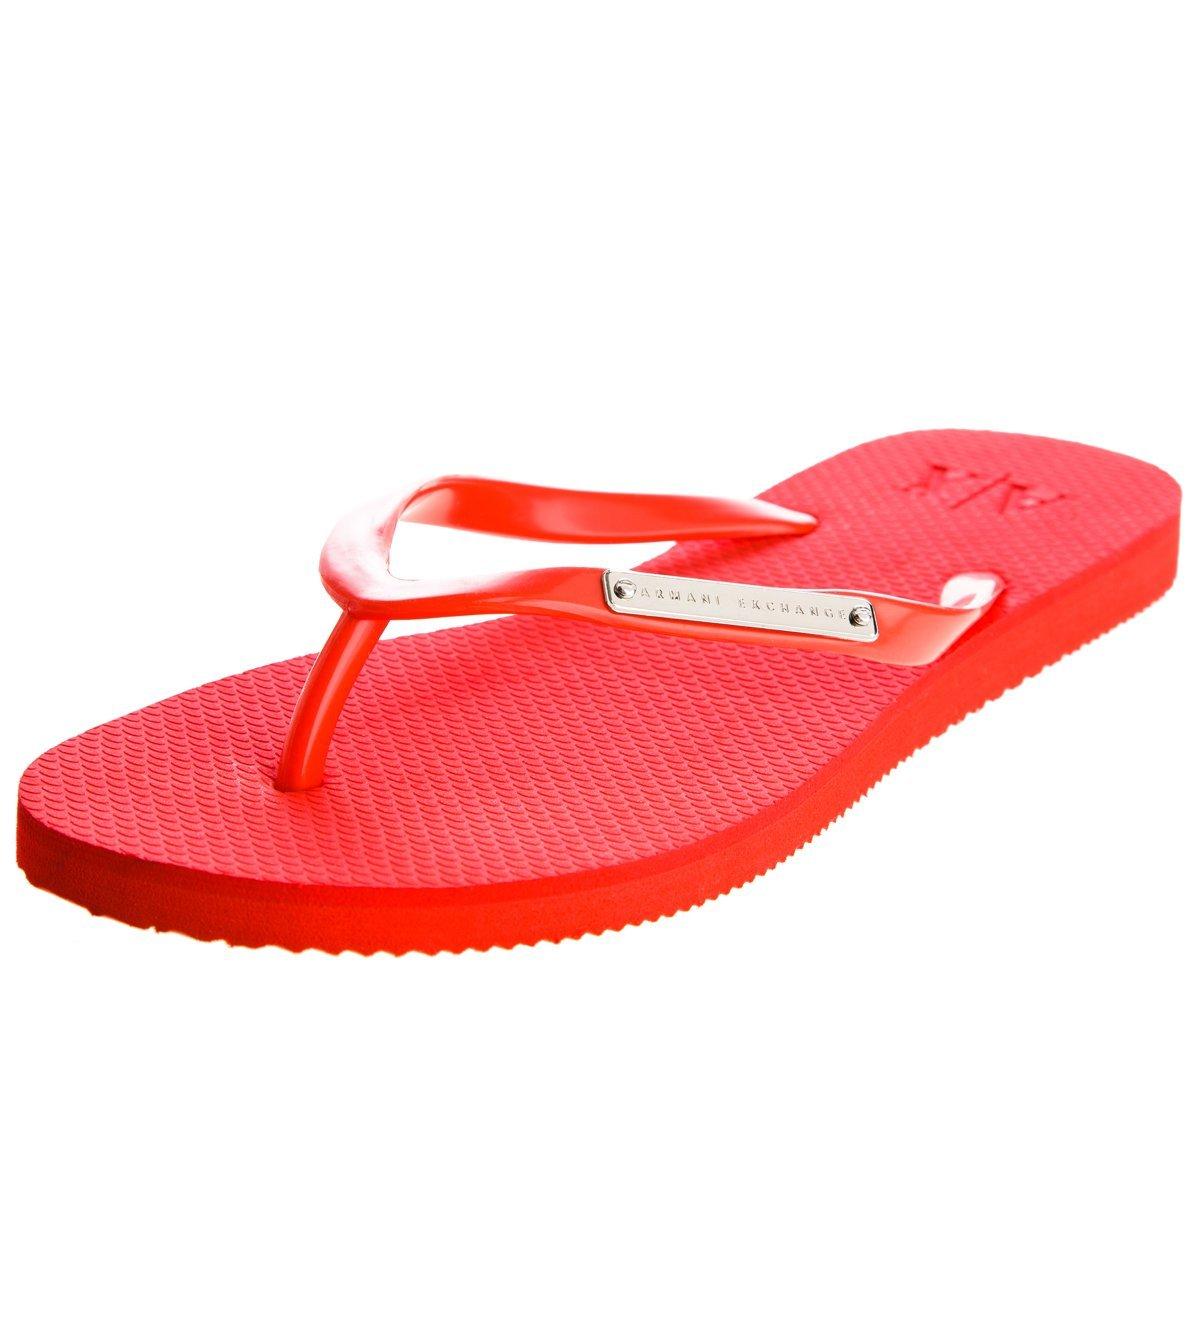 c5be135fbea Armani Exchange Womens Logo Plate Flip Flop - TOMATO — Armani Shoes